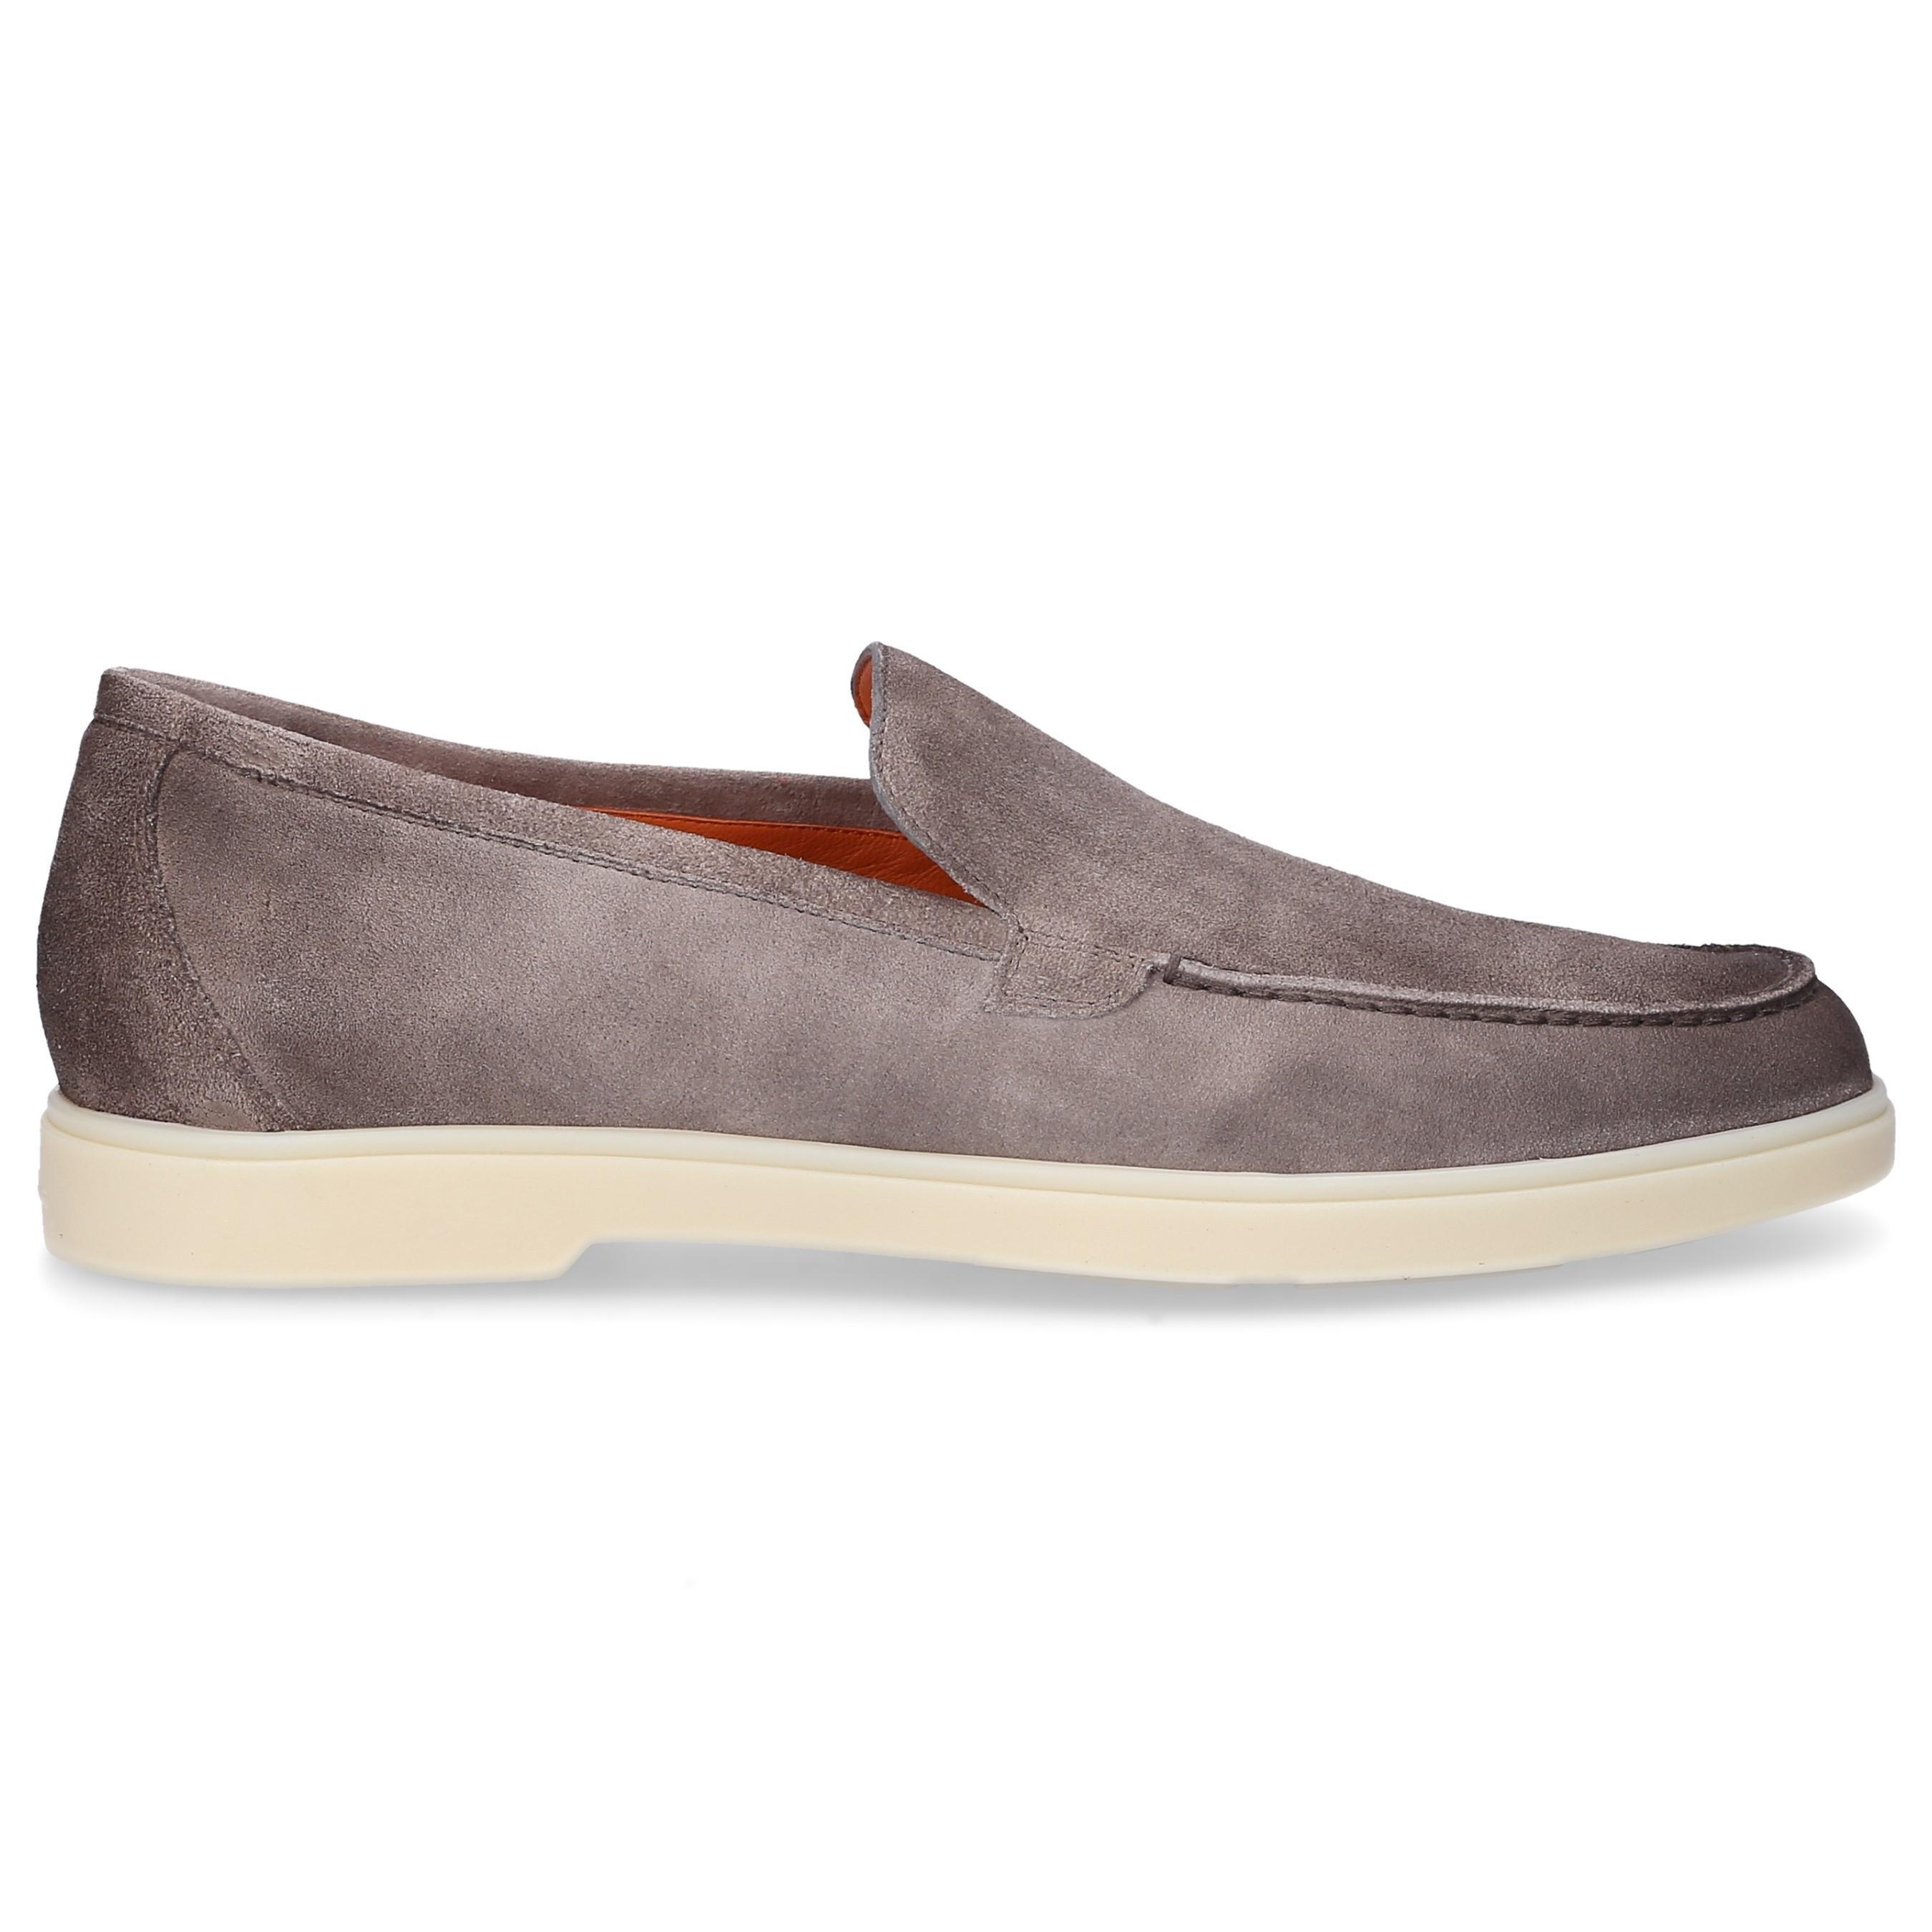 Santoni Suede Loafers 15996 in Grey